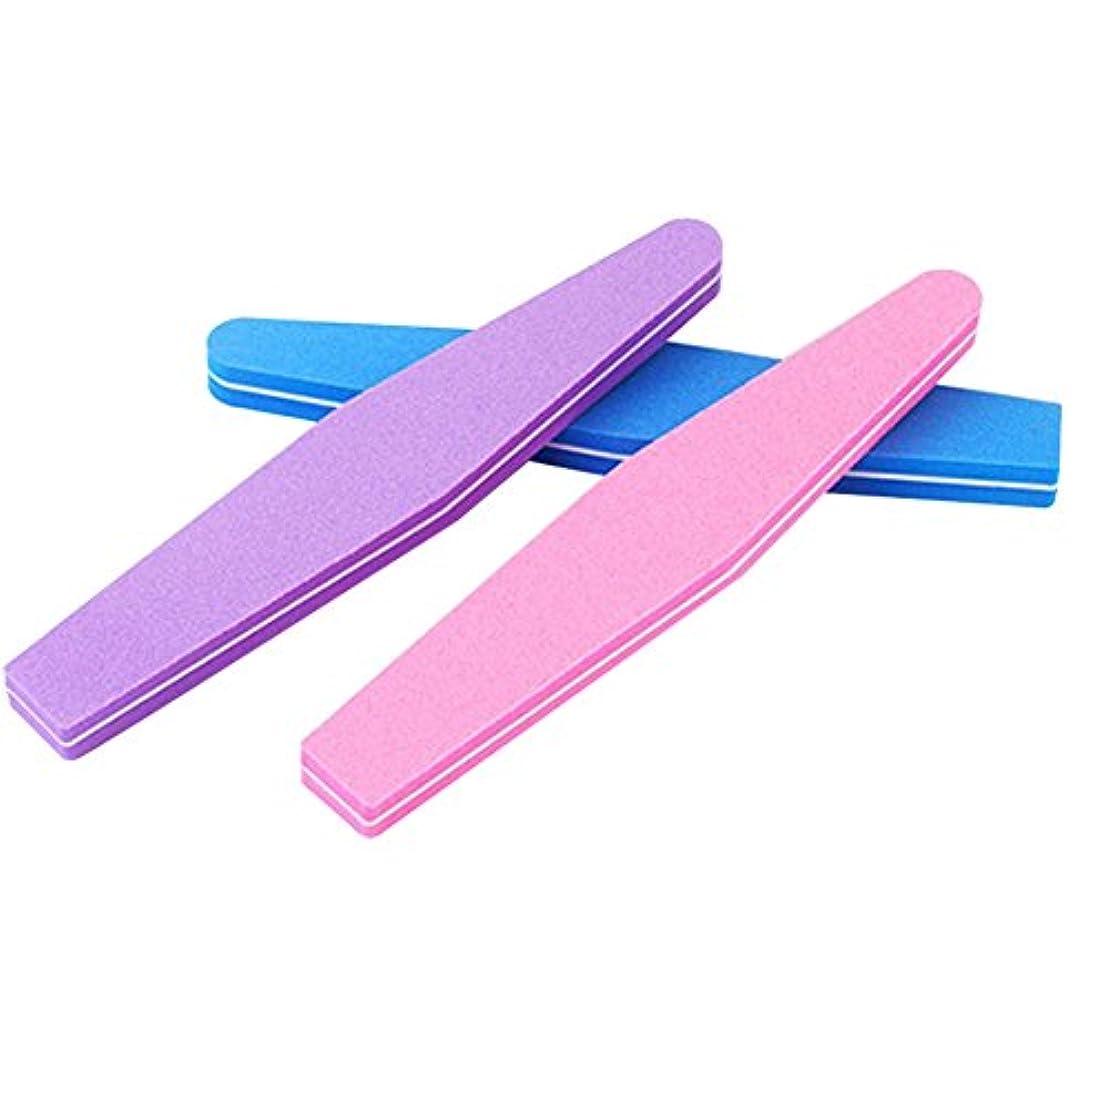 Poonikuuネイルやすり ネイルファイル 爪ヤスリ爪磨き ケアツール ネイルツール 小型便利 ランダムカラー 1本セット